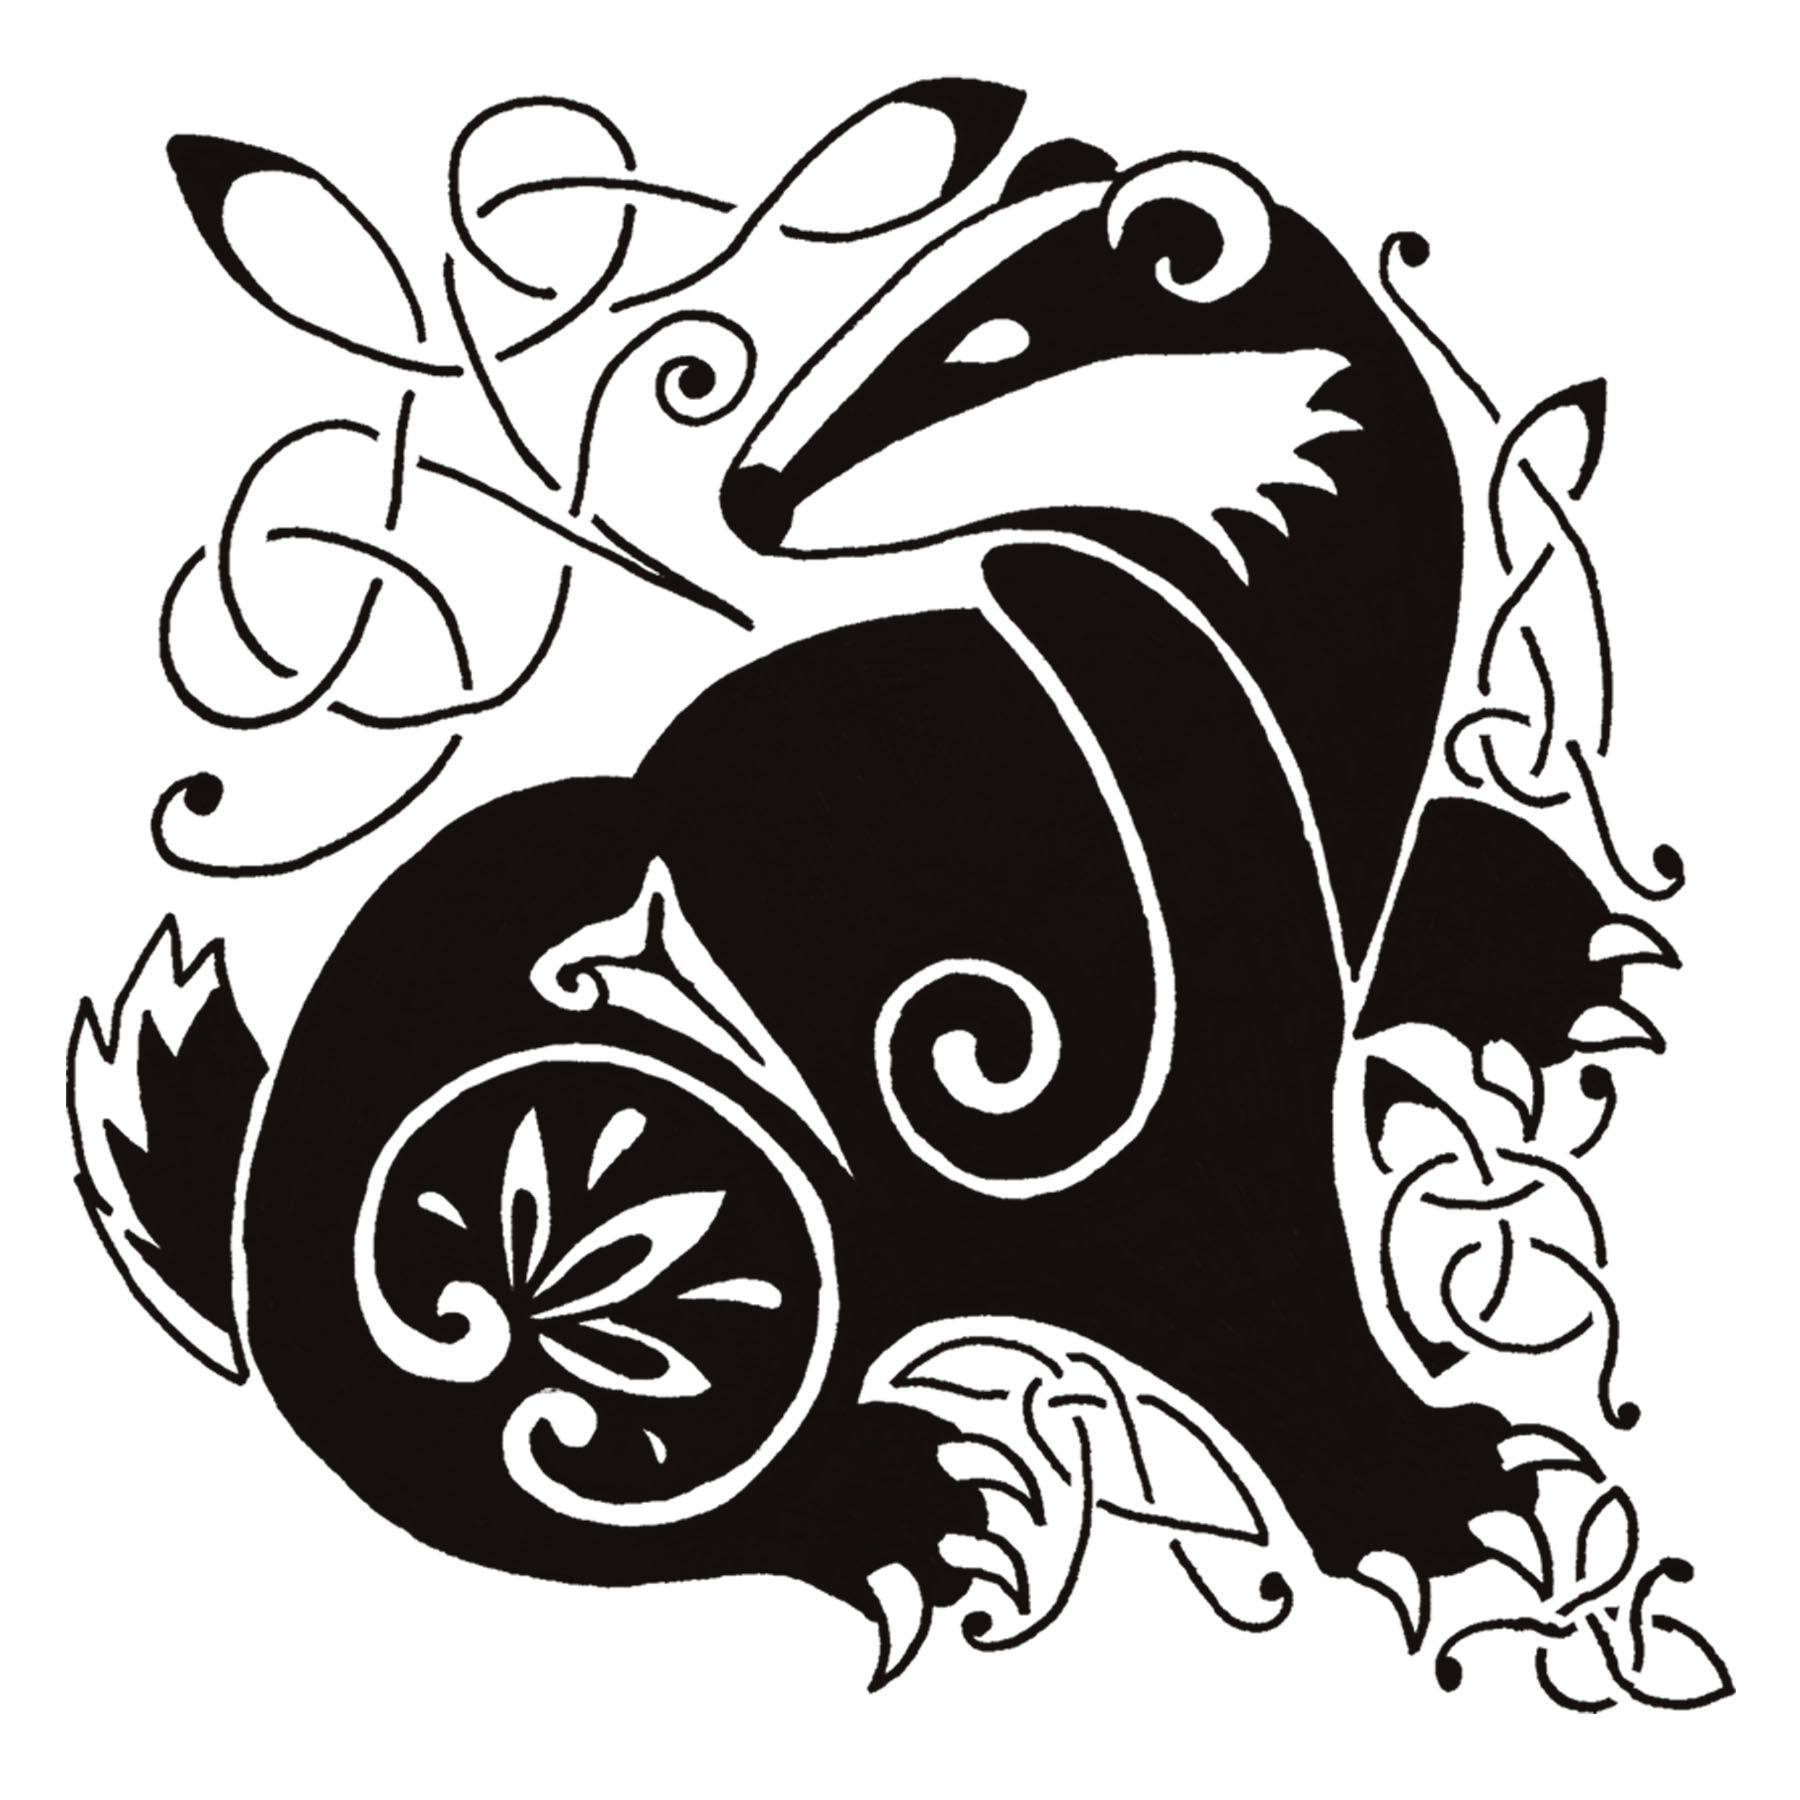 celtic badger - Google Search | Motifs | Badger tattoo ...